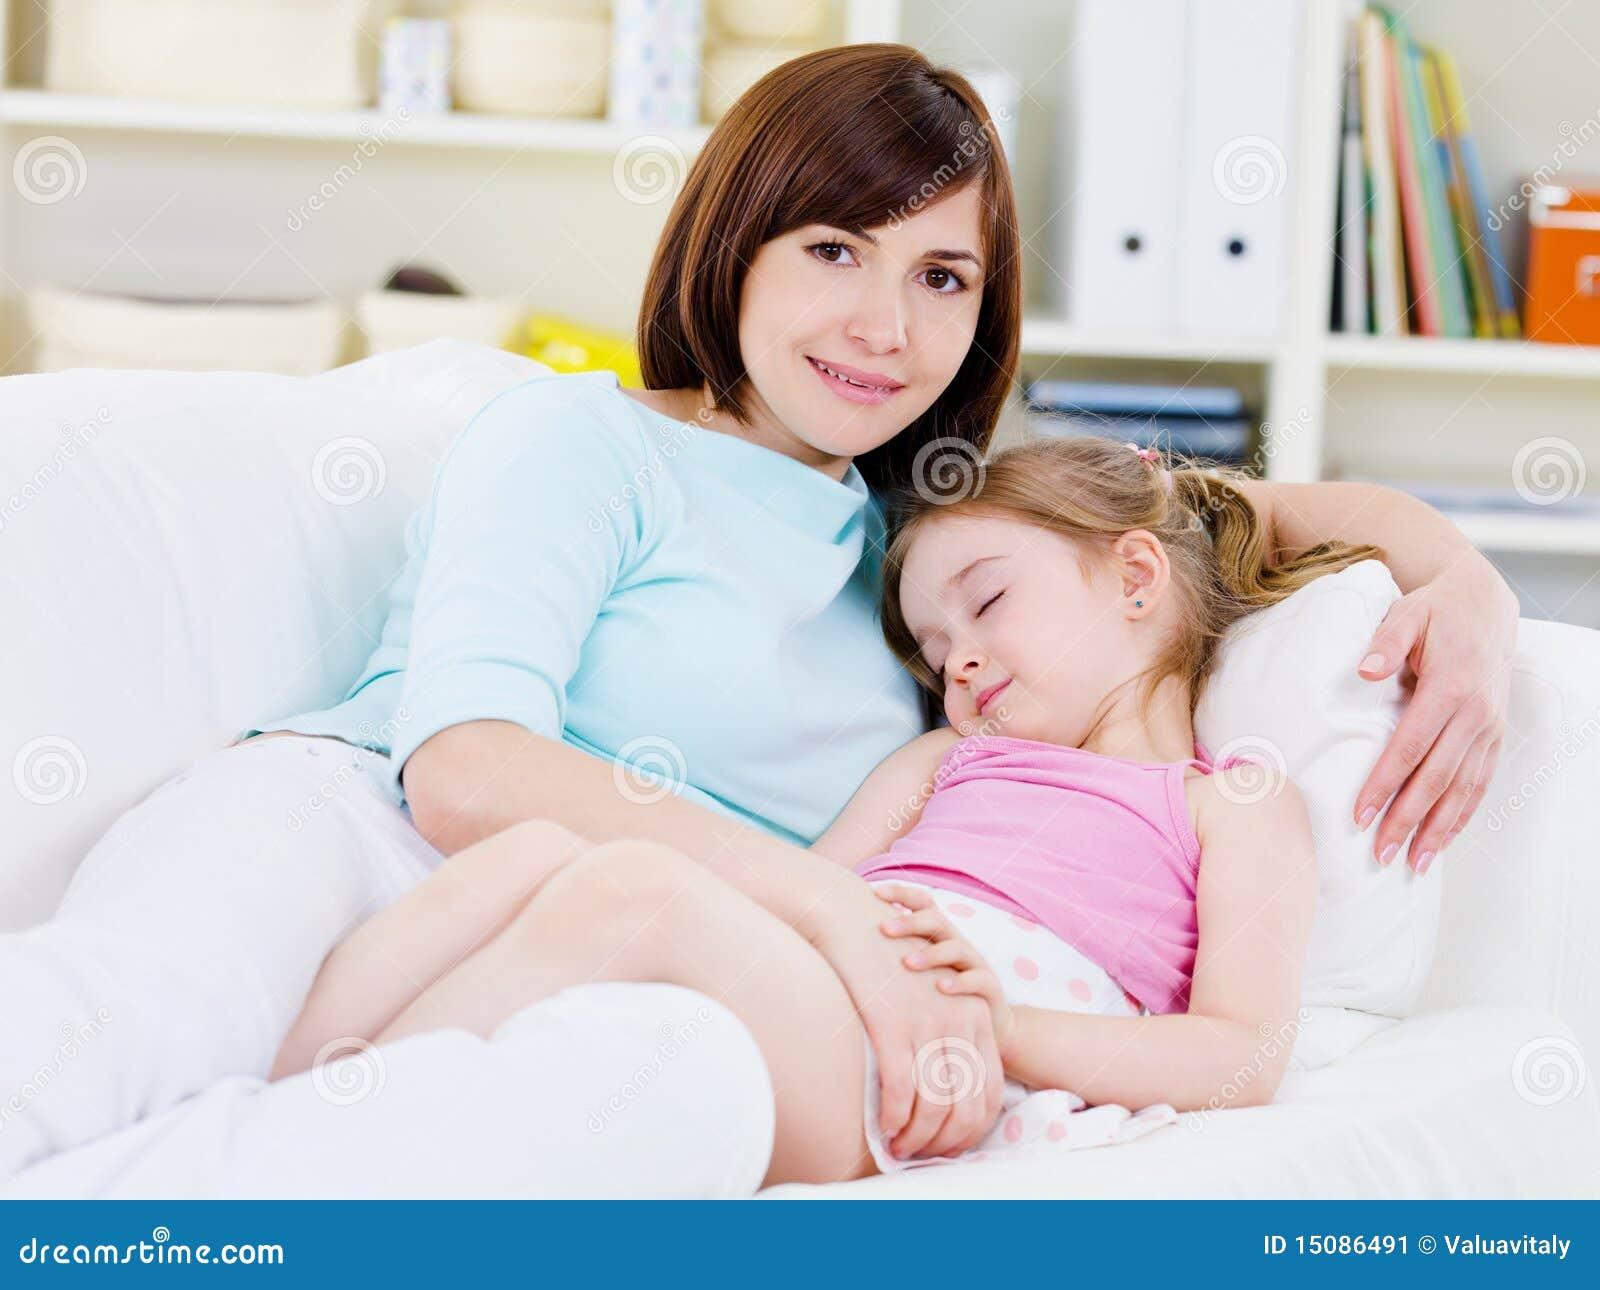 Спящая мать фото 19 фотография